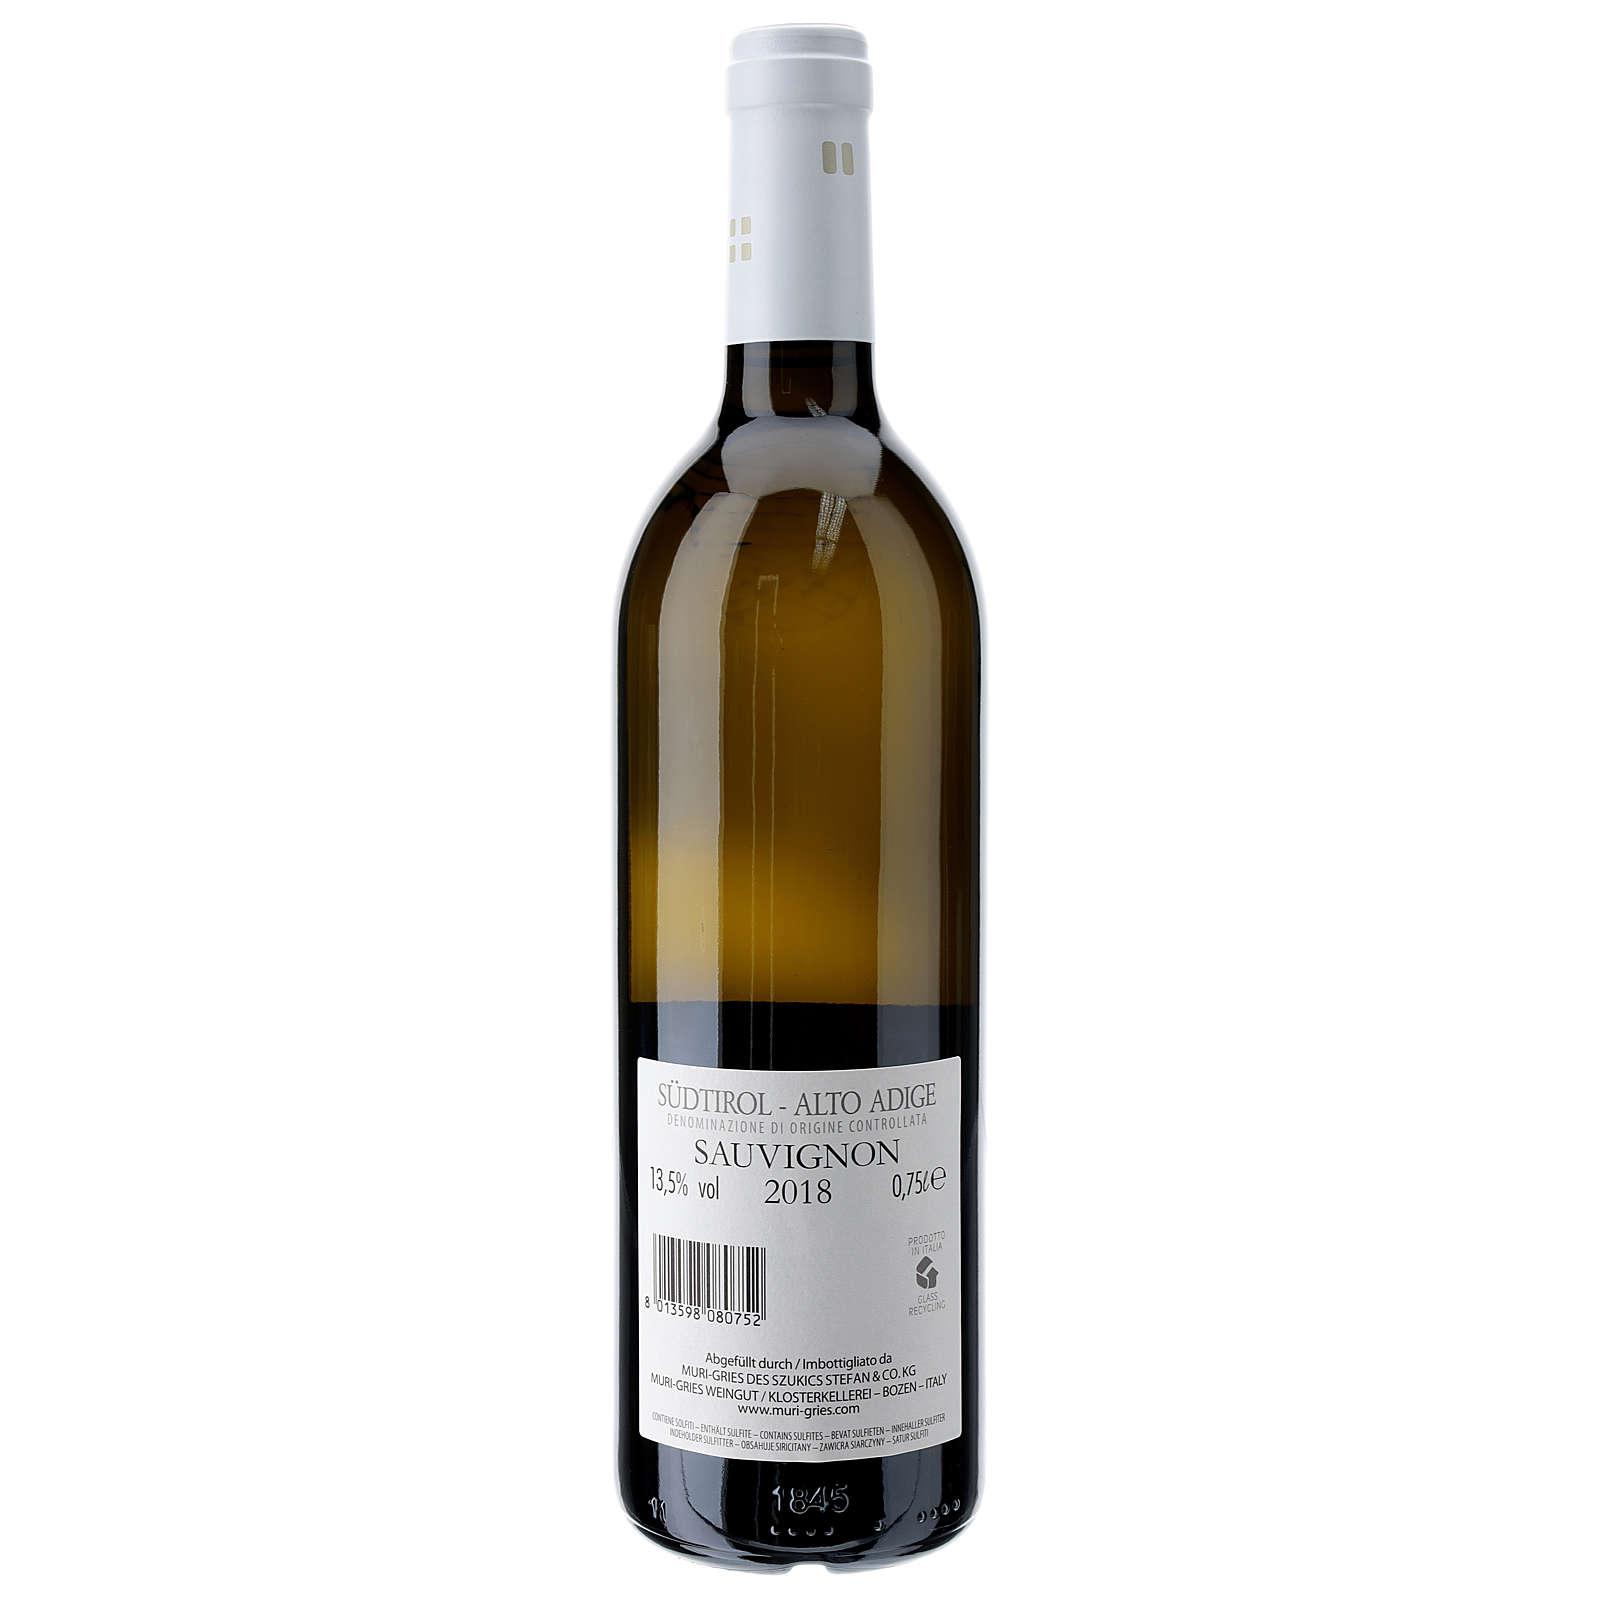 Vino Sauvignon DOC 2018 Abadía Muri Gries 750 ml 3